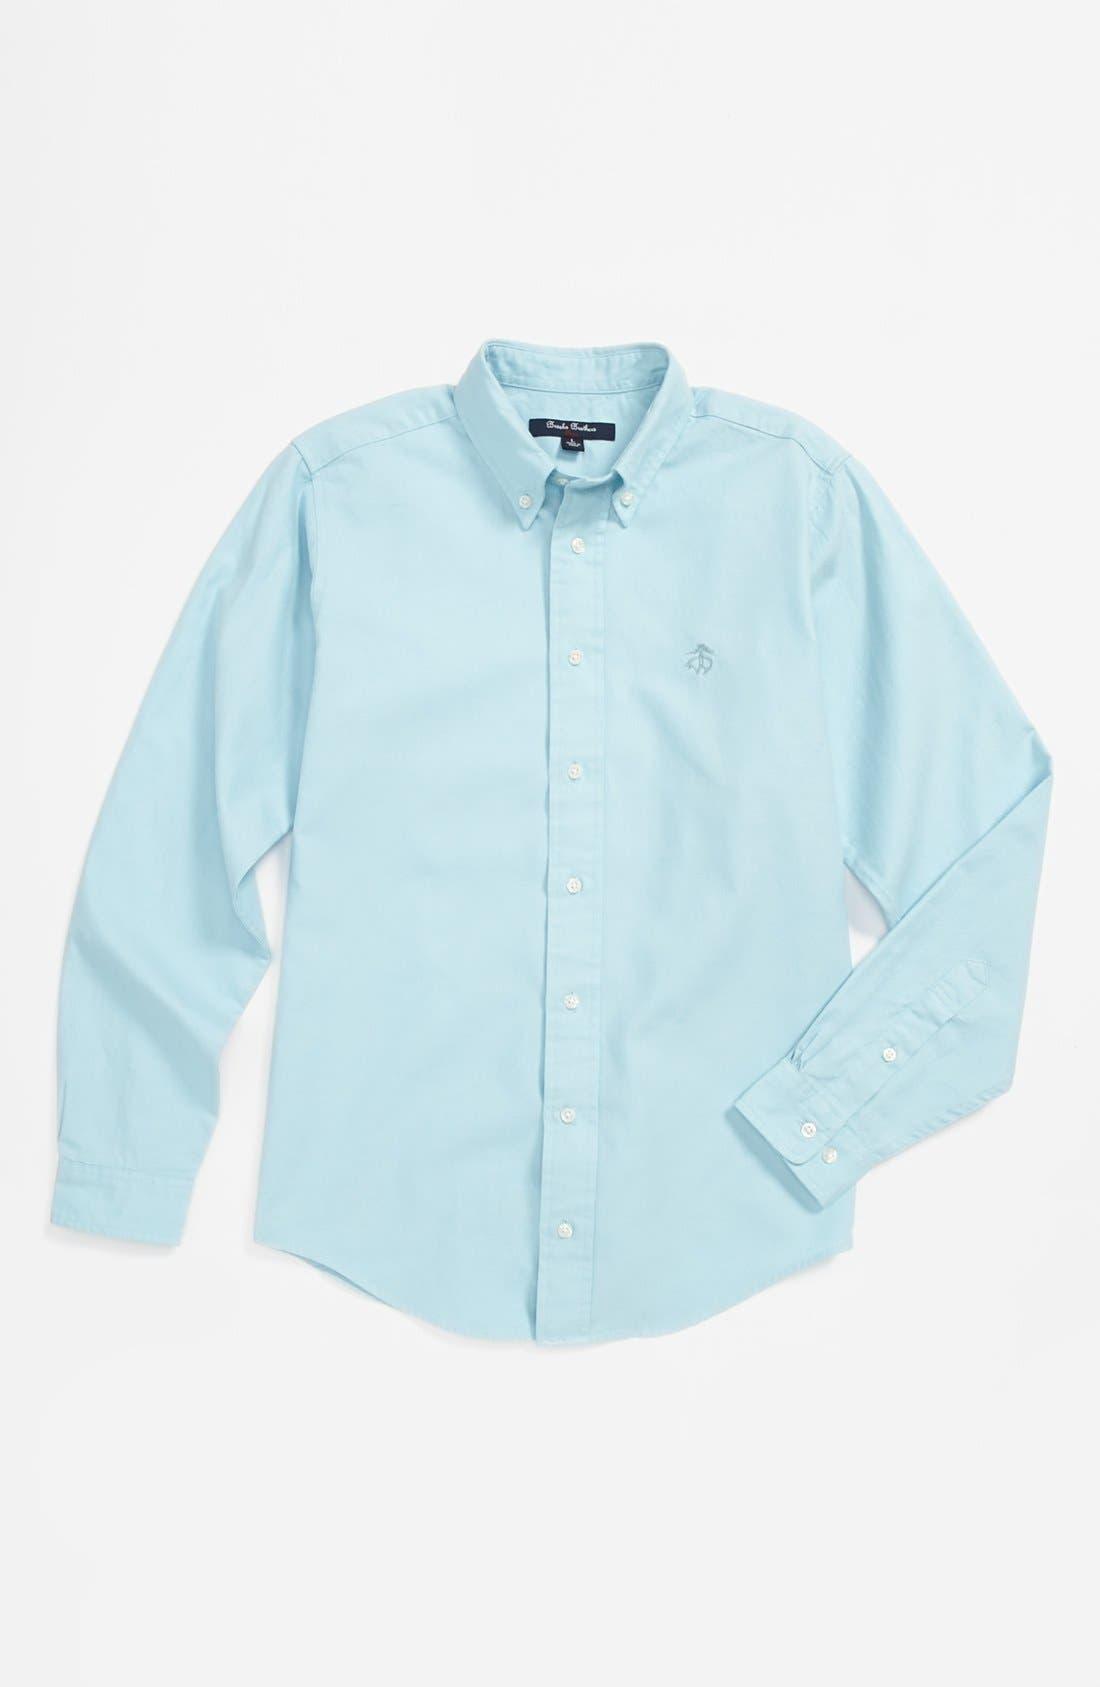 Main Image - Brooks Brothers Oxford Woven Shirt (Big Boys)